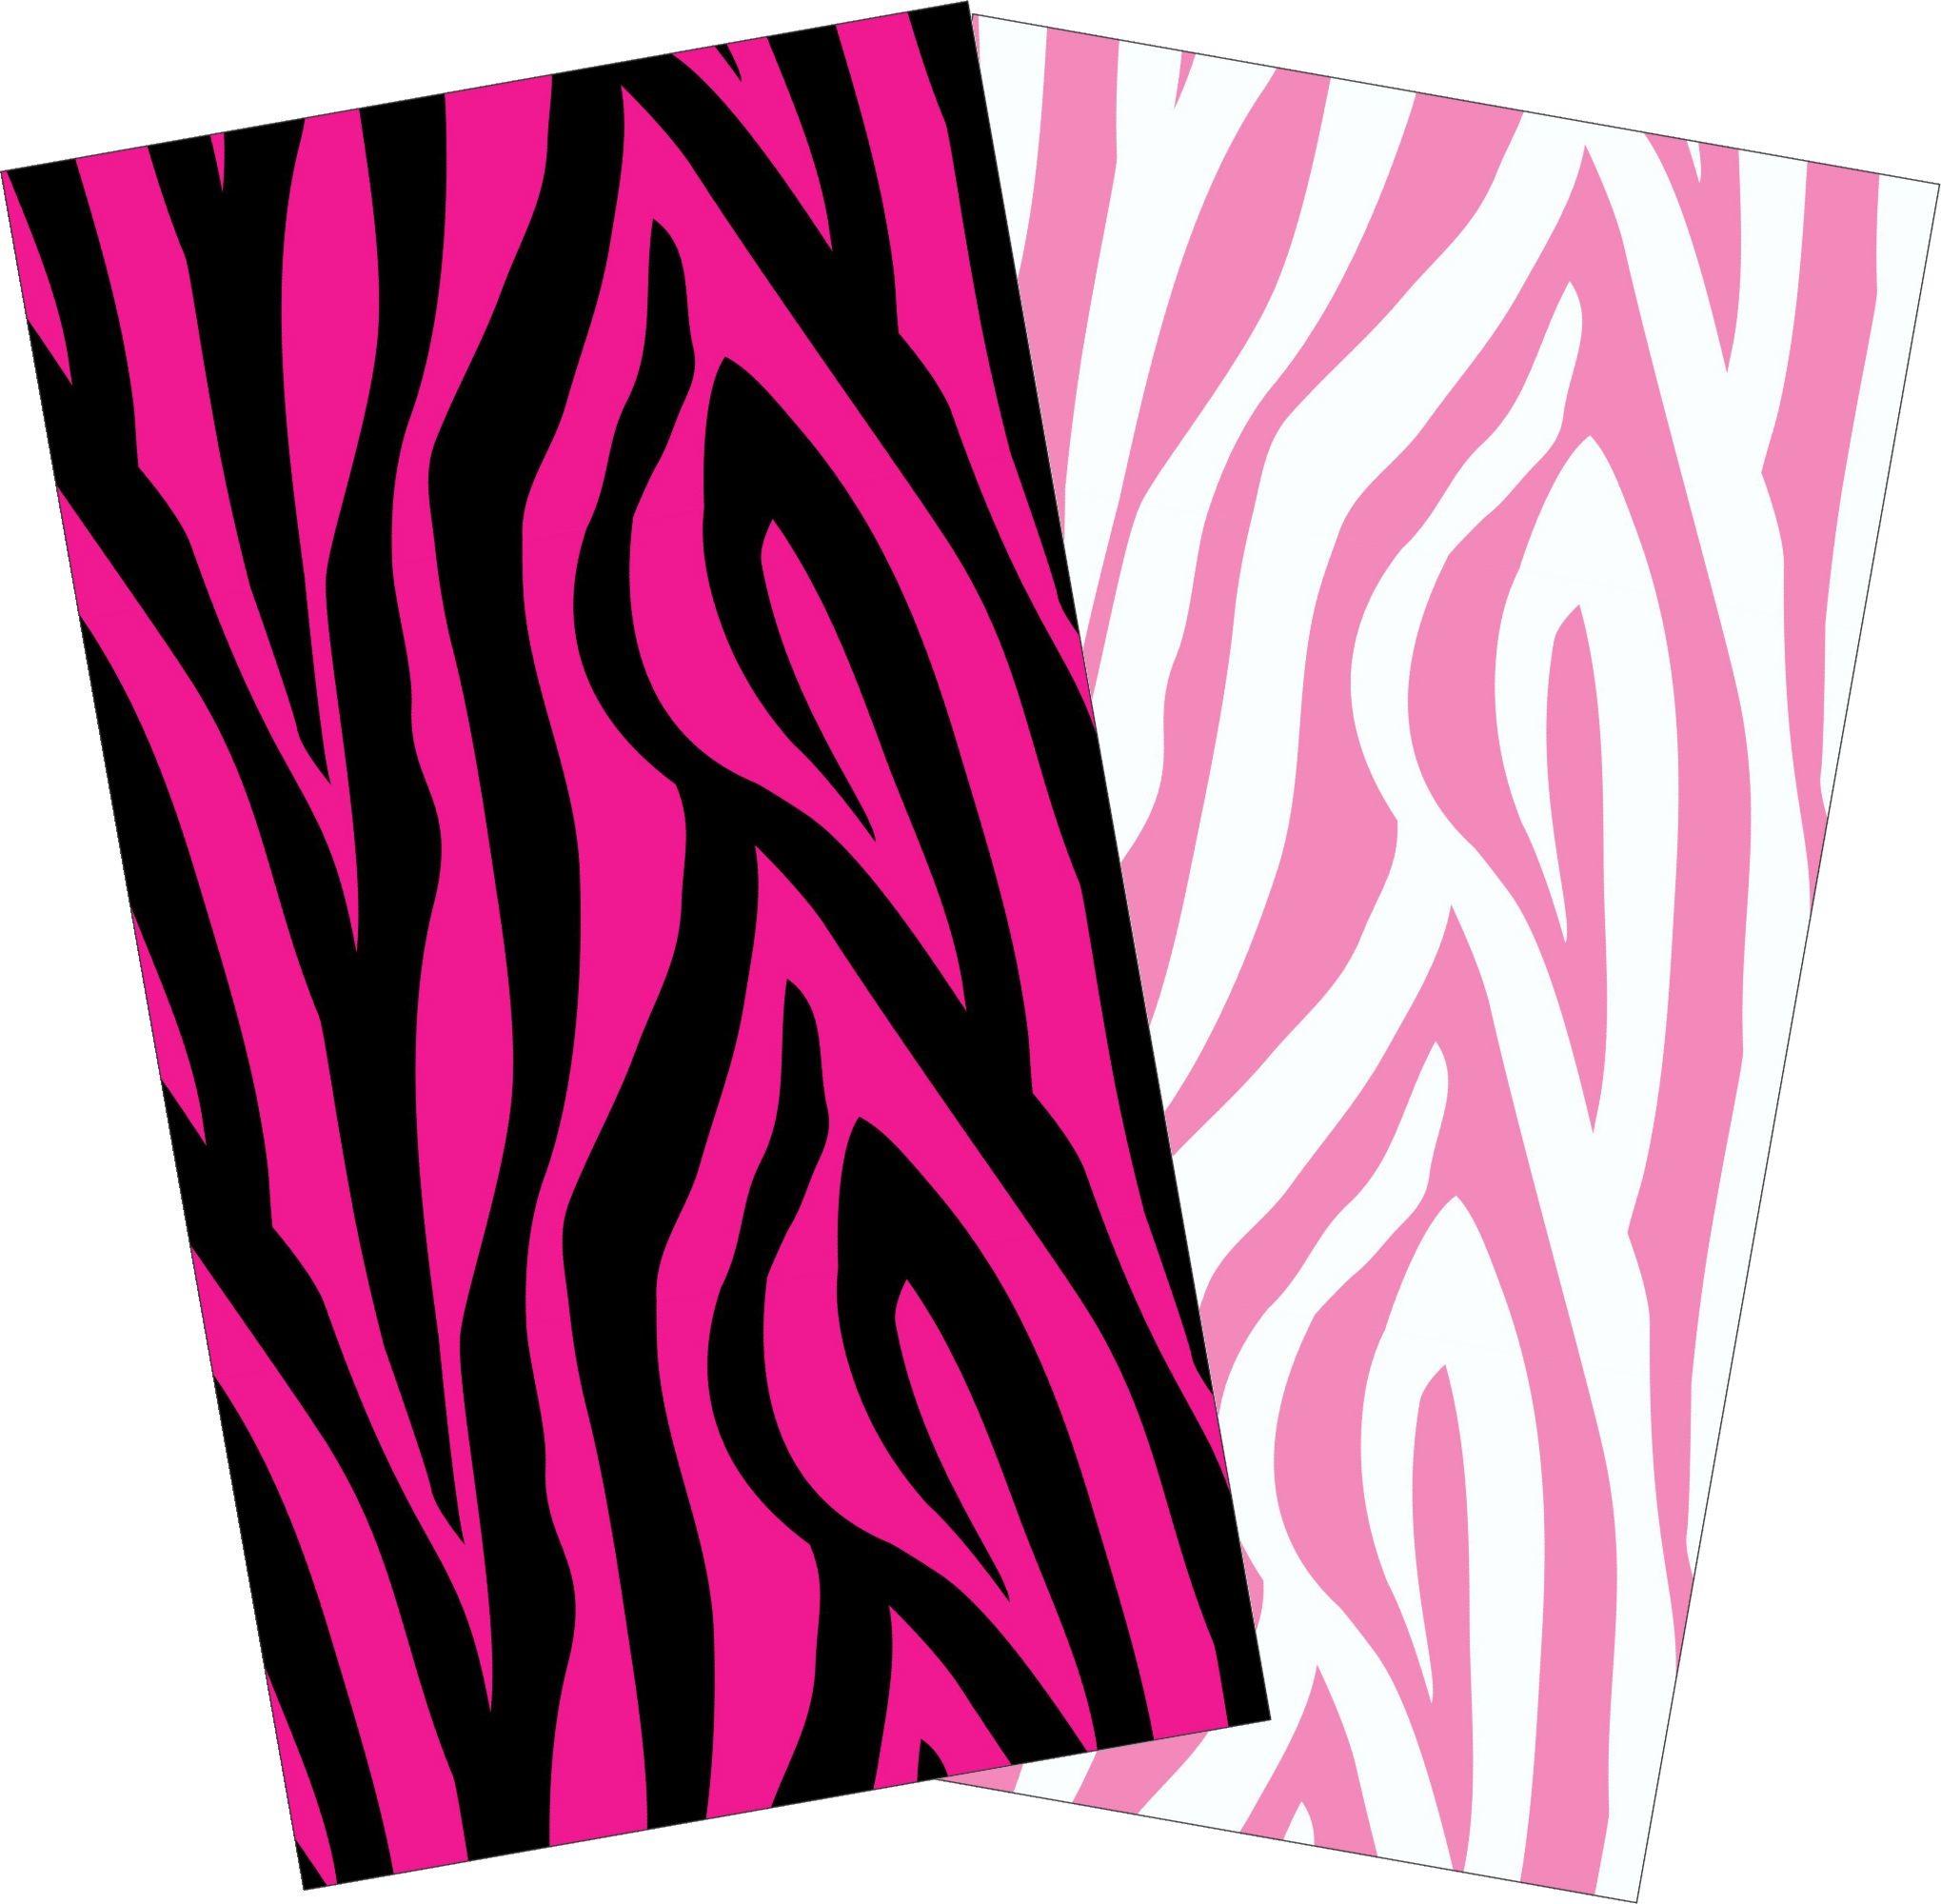 Zebra Backgrounds ·① Multi Colored Zebra Print Wallpapers